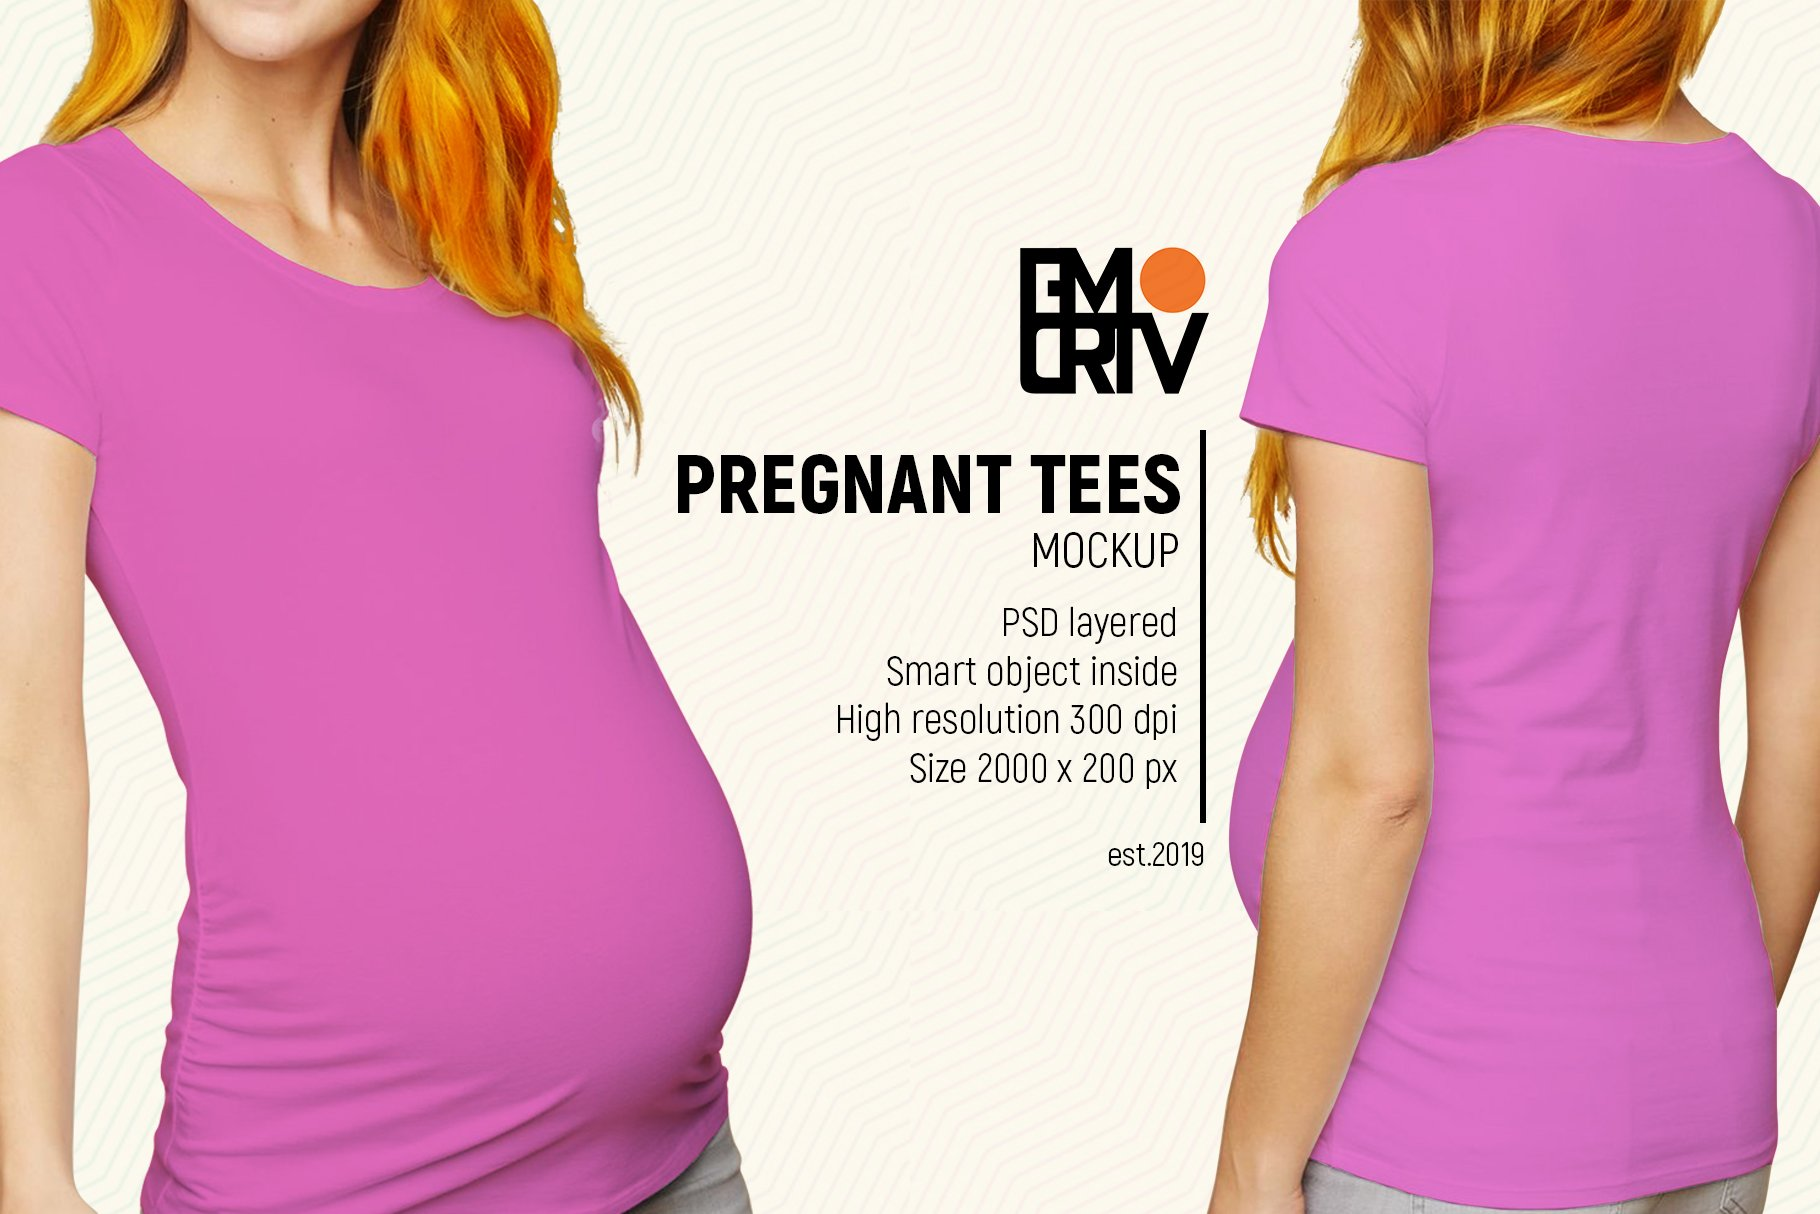 koža uzbuđenje posipati free pregnant t shirt mockup -  goldstandardsounds.com  goldstandardsounds.com